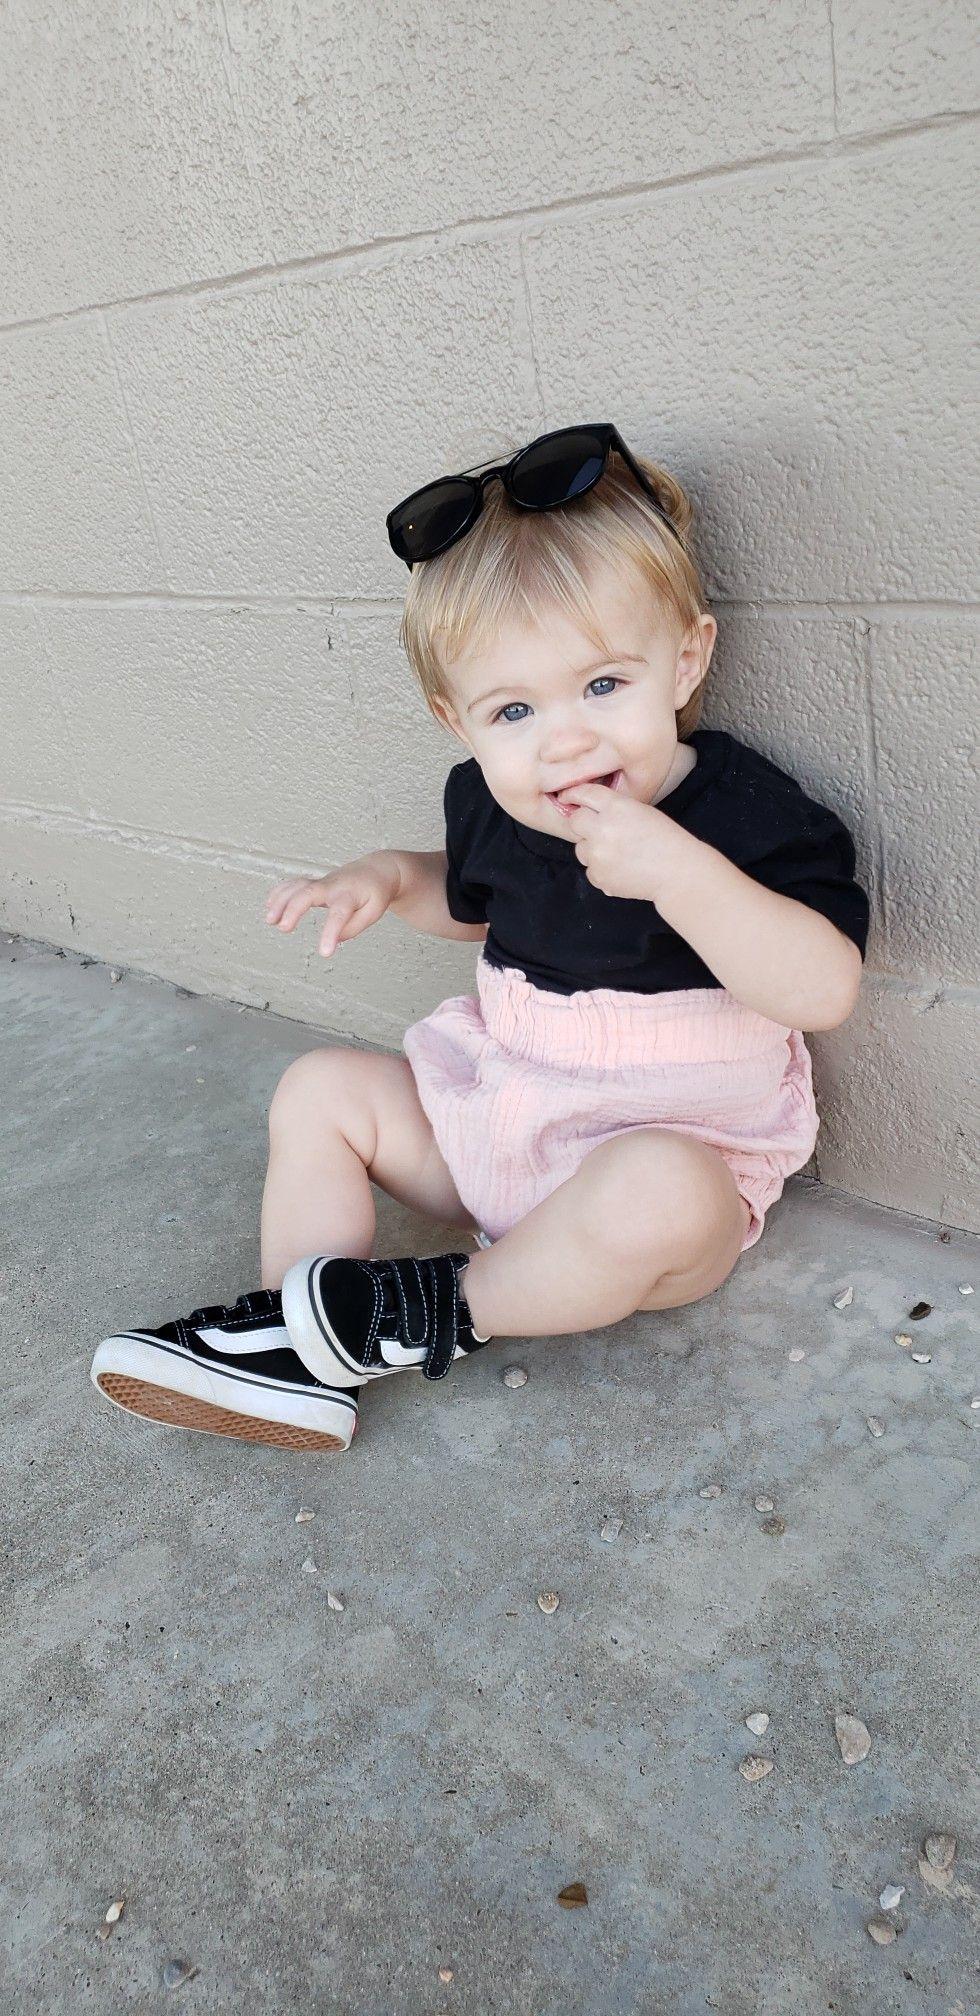 Baby girl vans, Baby vans, Vans outfit